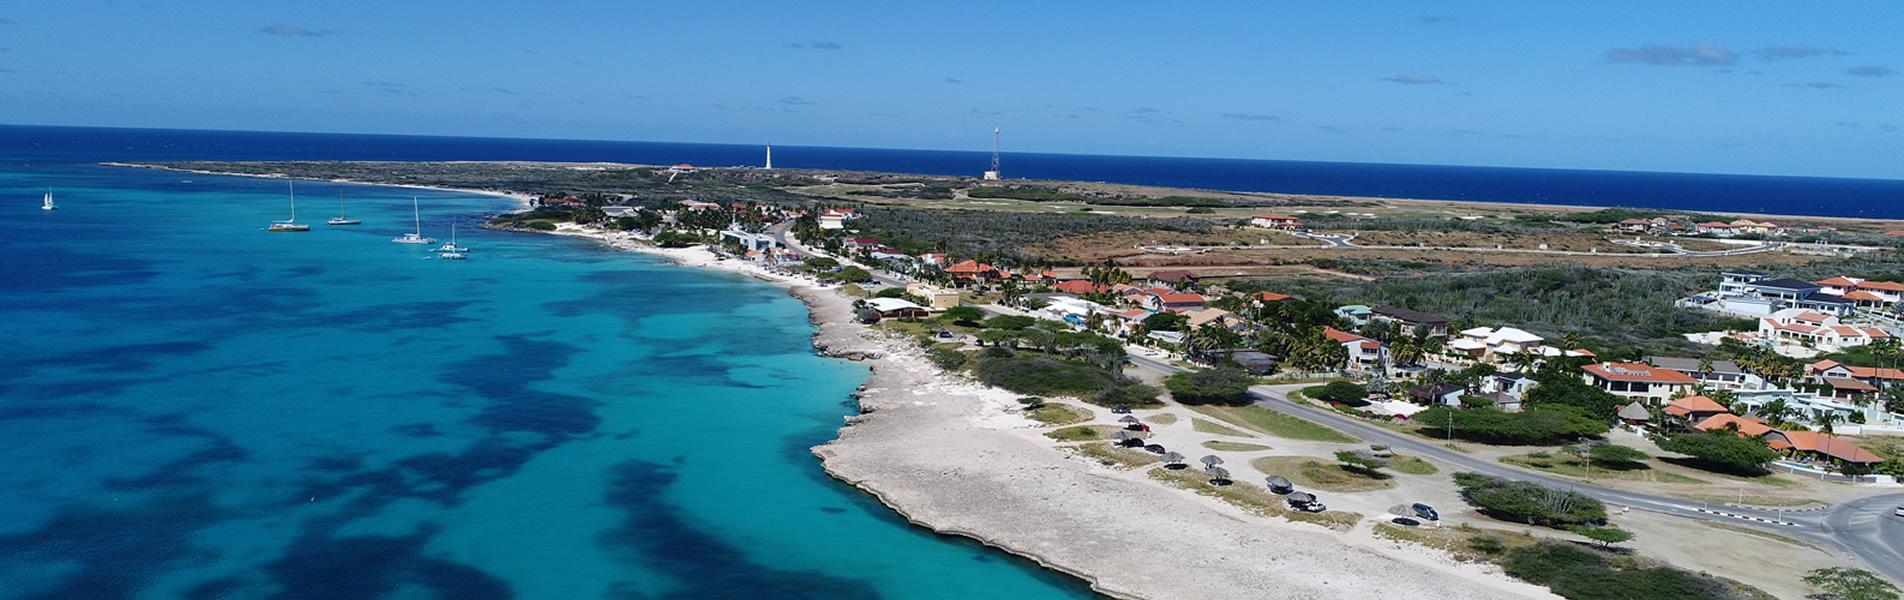 https://www.arubapalmsrealtors.com/wp-content/uploads/2018/03/Aruba-coast-real-estate-houses-for-sale-hero600.jpg